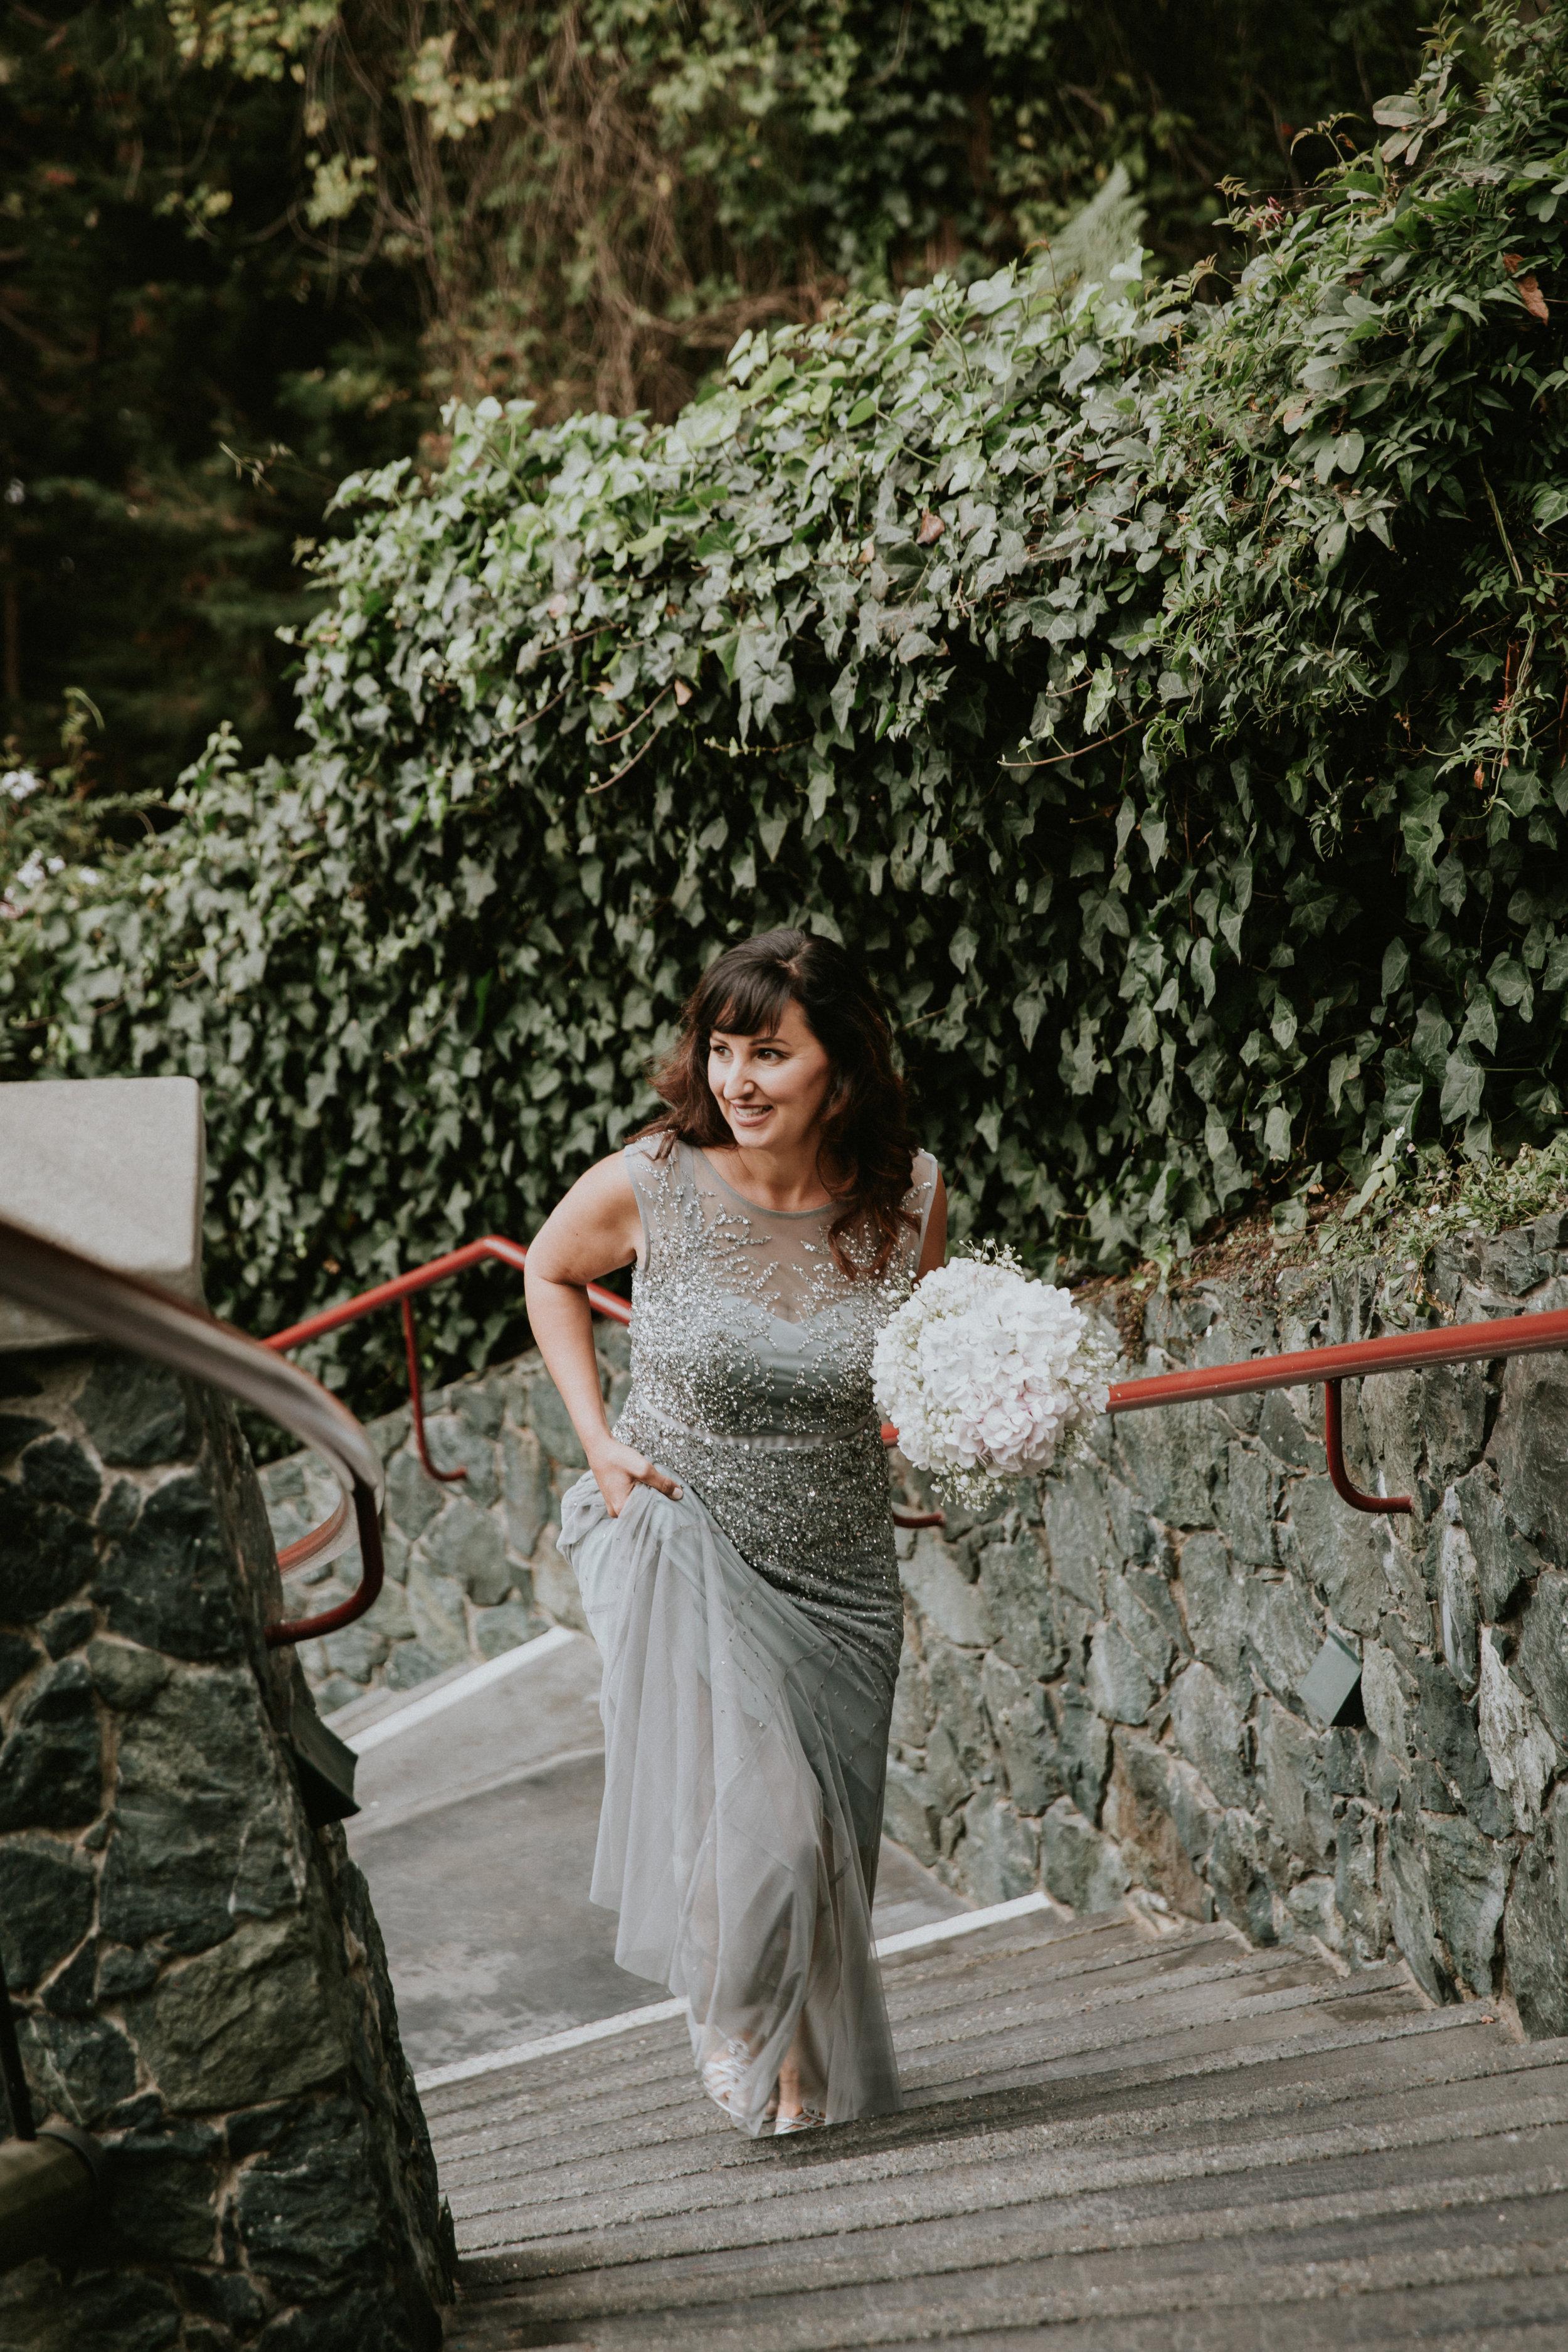 Capitola-Santa-Cruz-wedding-photographer-35.jpg